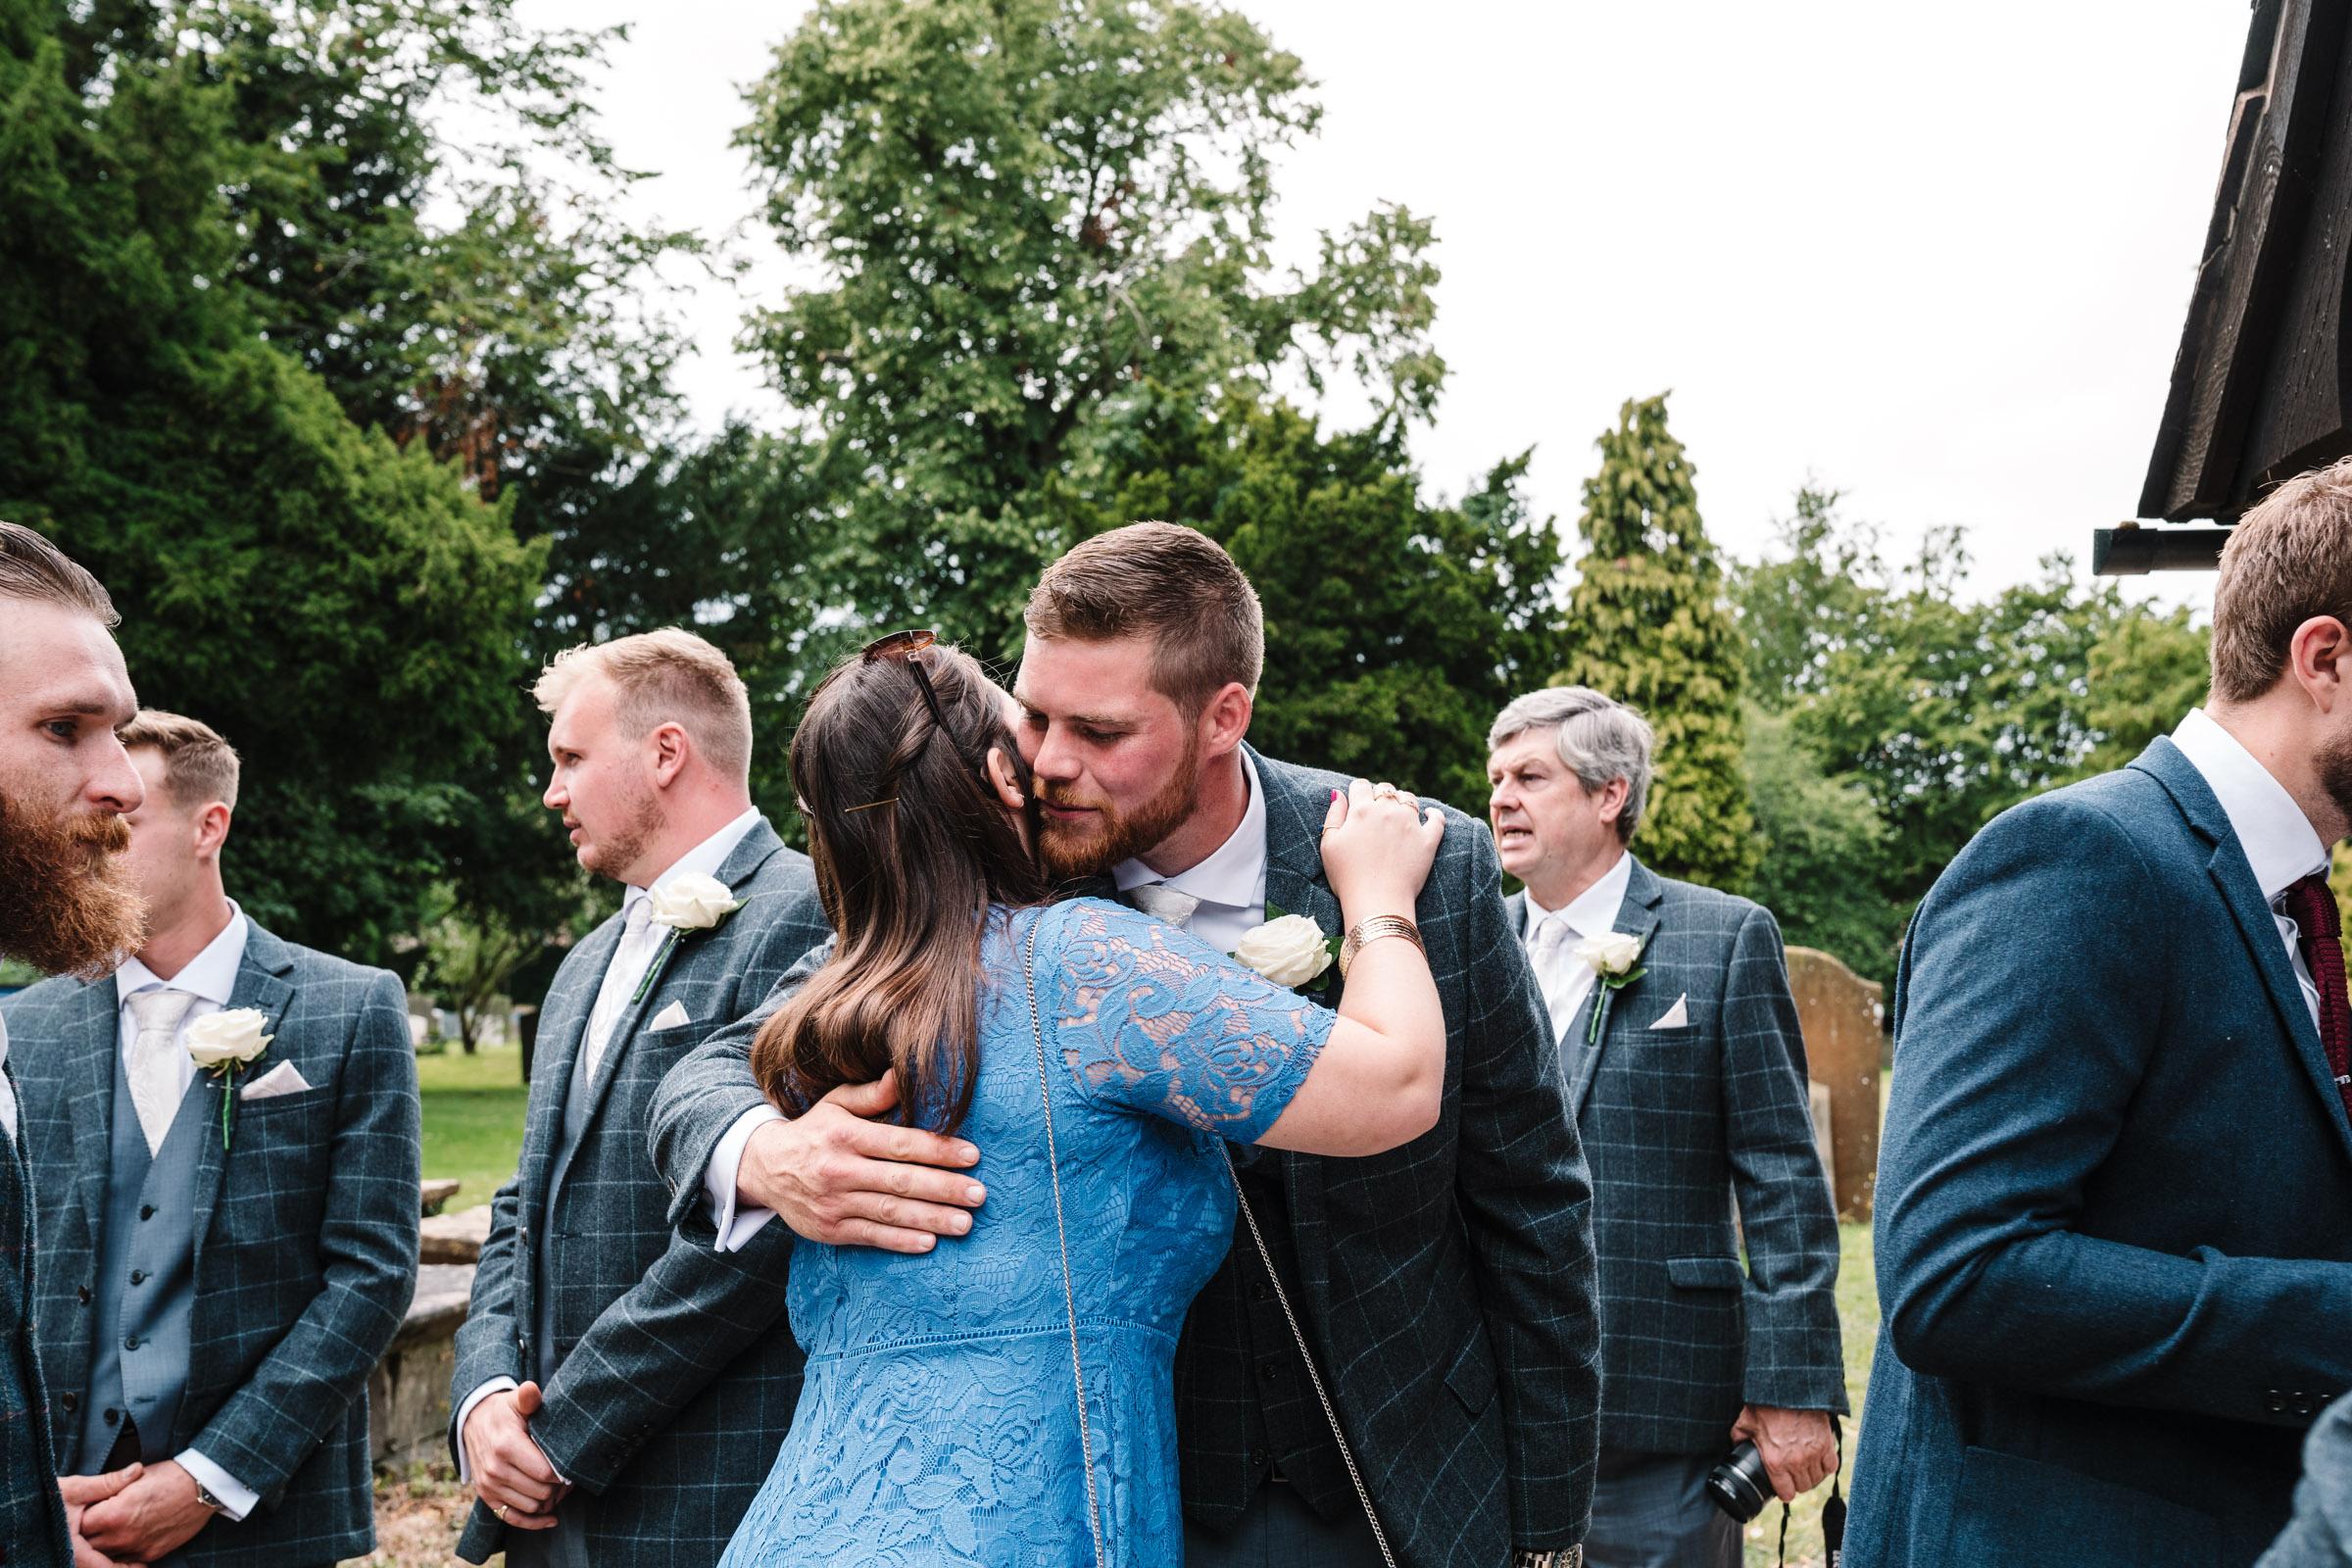 groom greeting guests before church wedding